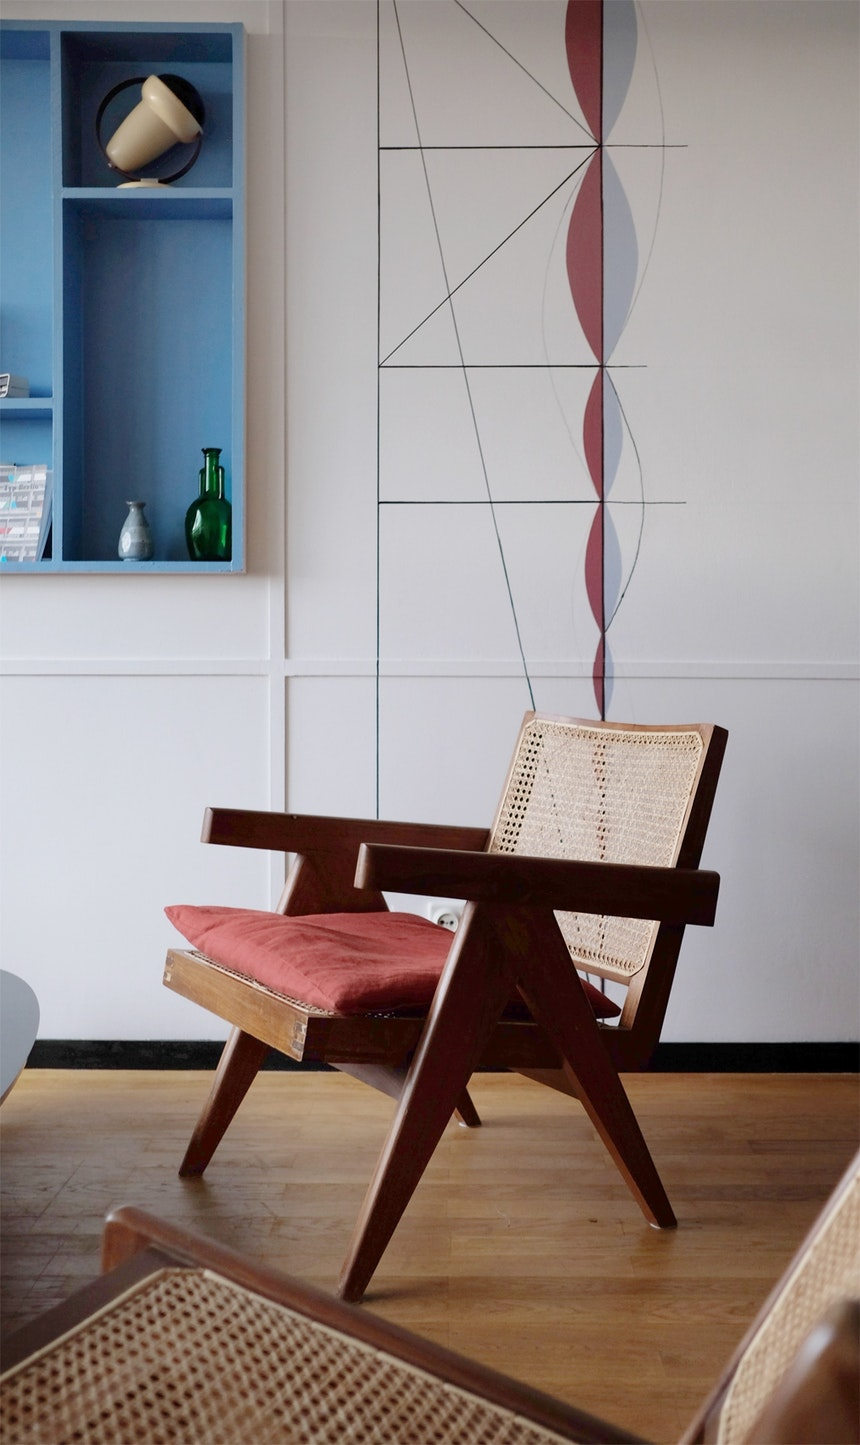 Sessel – Design Pierre Jeanneret, Vetter und Mitarbeiter Le Corbusiers